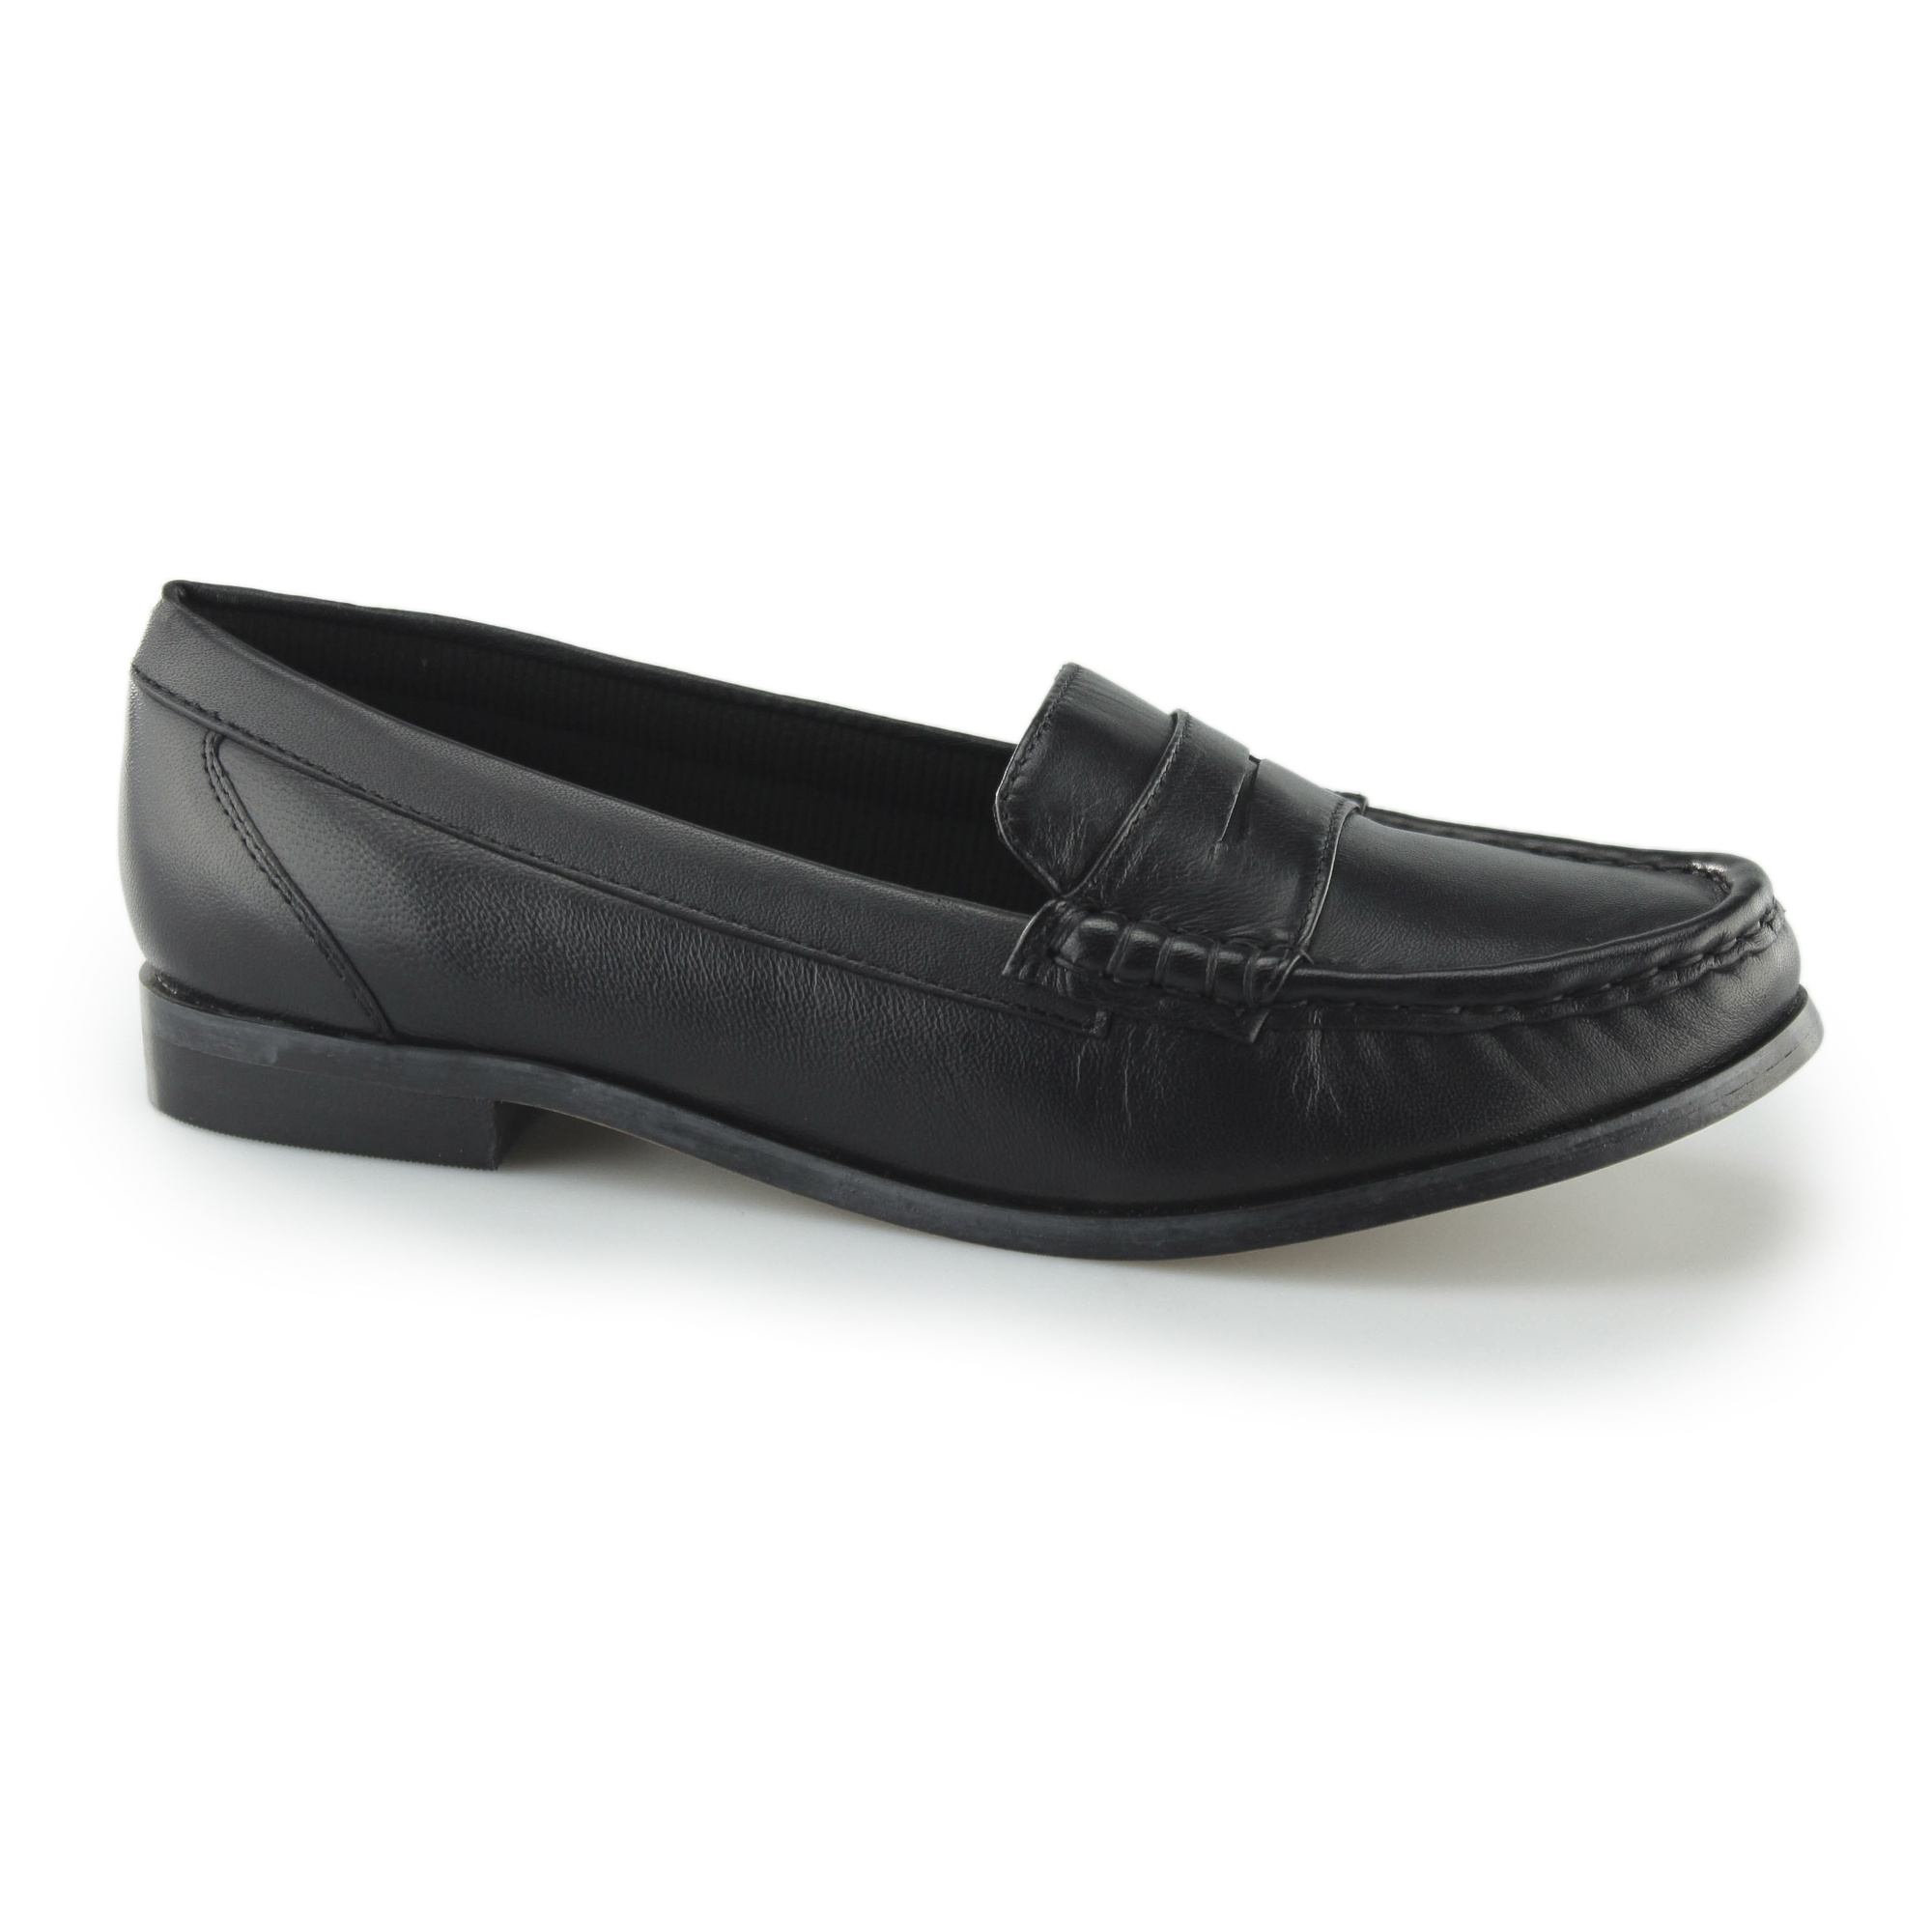 dbafc0a2062 Comfort Plus MICHAELA Ladies Leather Wide Fit Shoes In Black